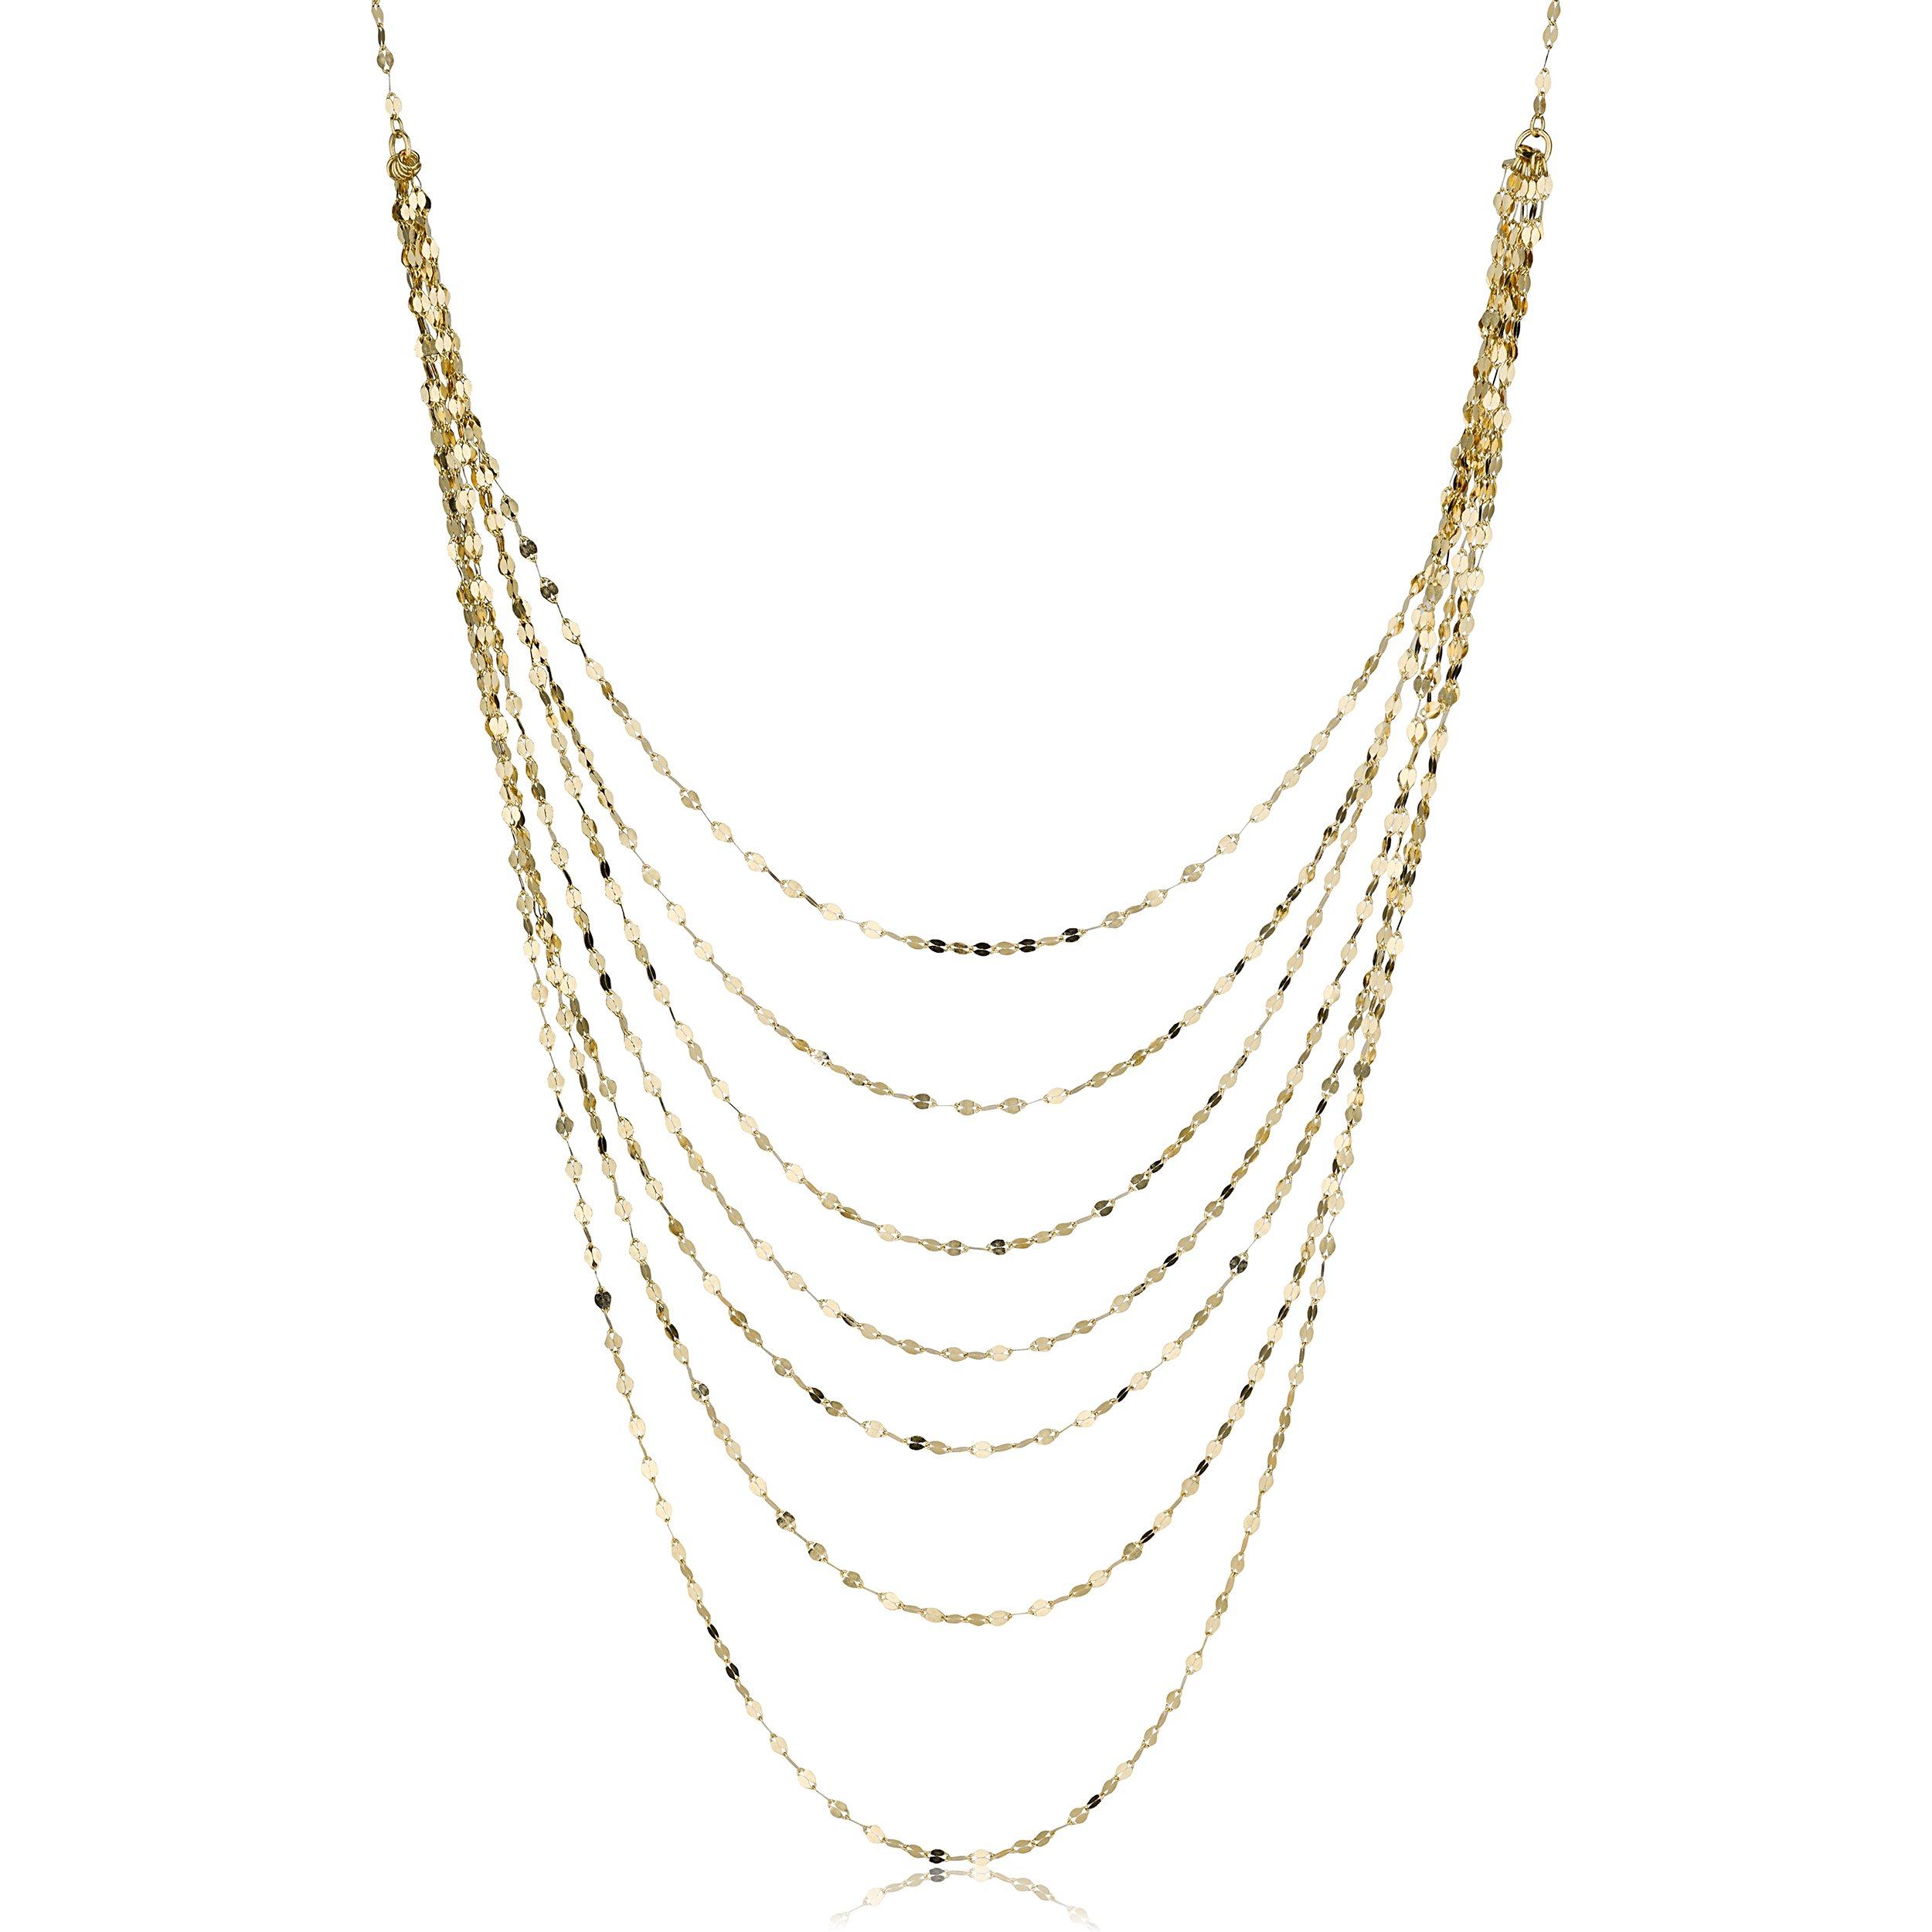 Kooljewelry 14k Yellow Gold Mirror Link Layered Necklace (18 inch) by Kooljewelry